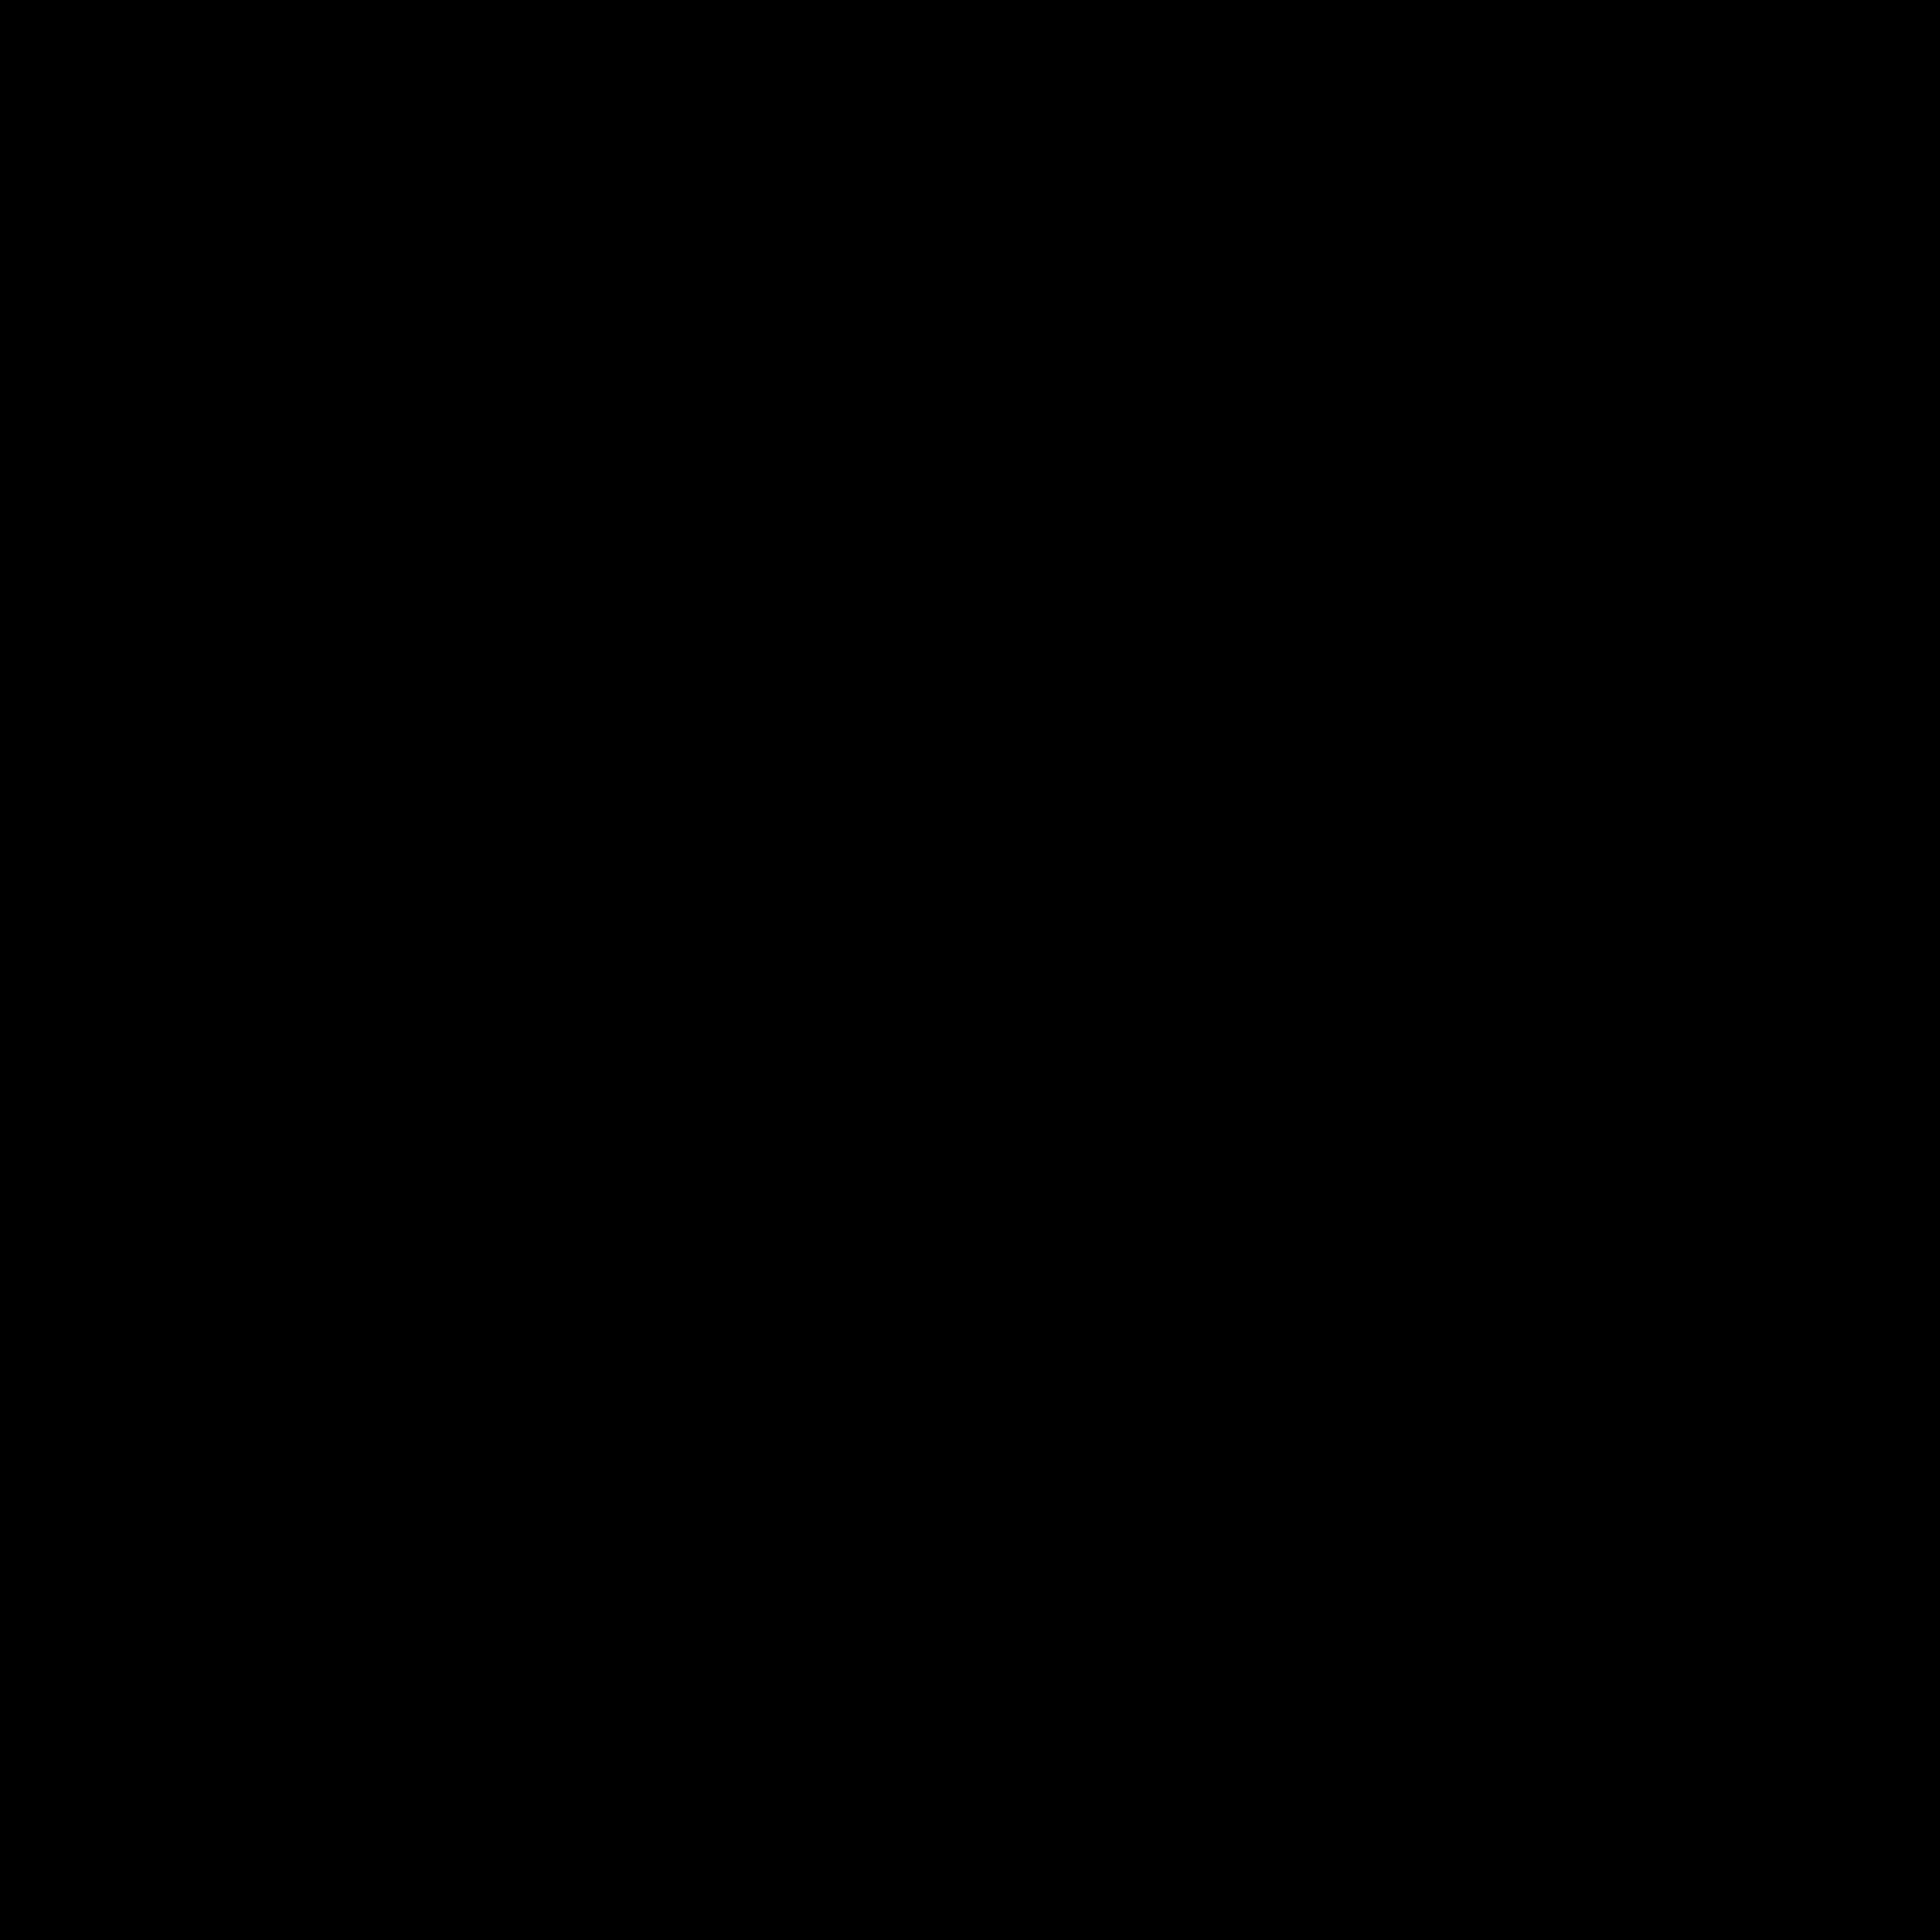 black, skydrive icon